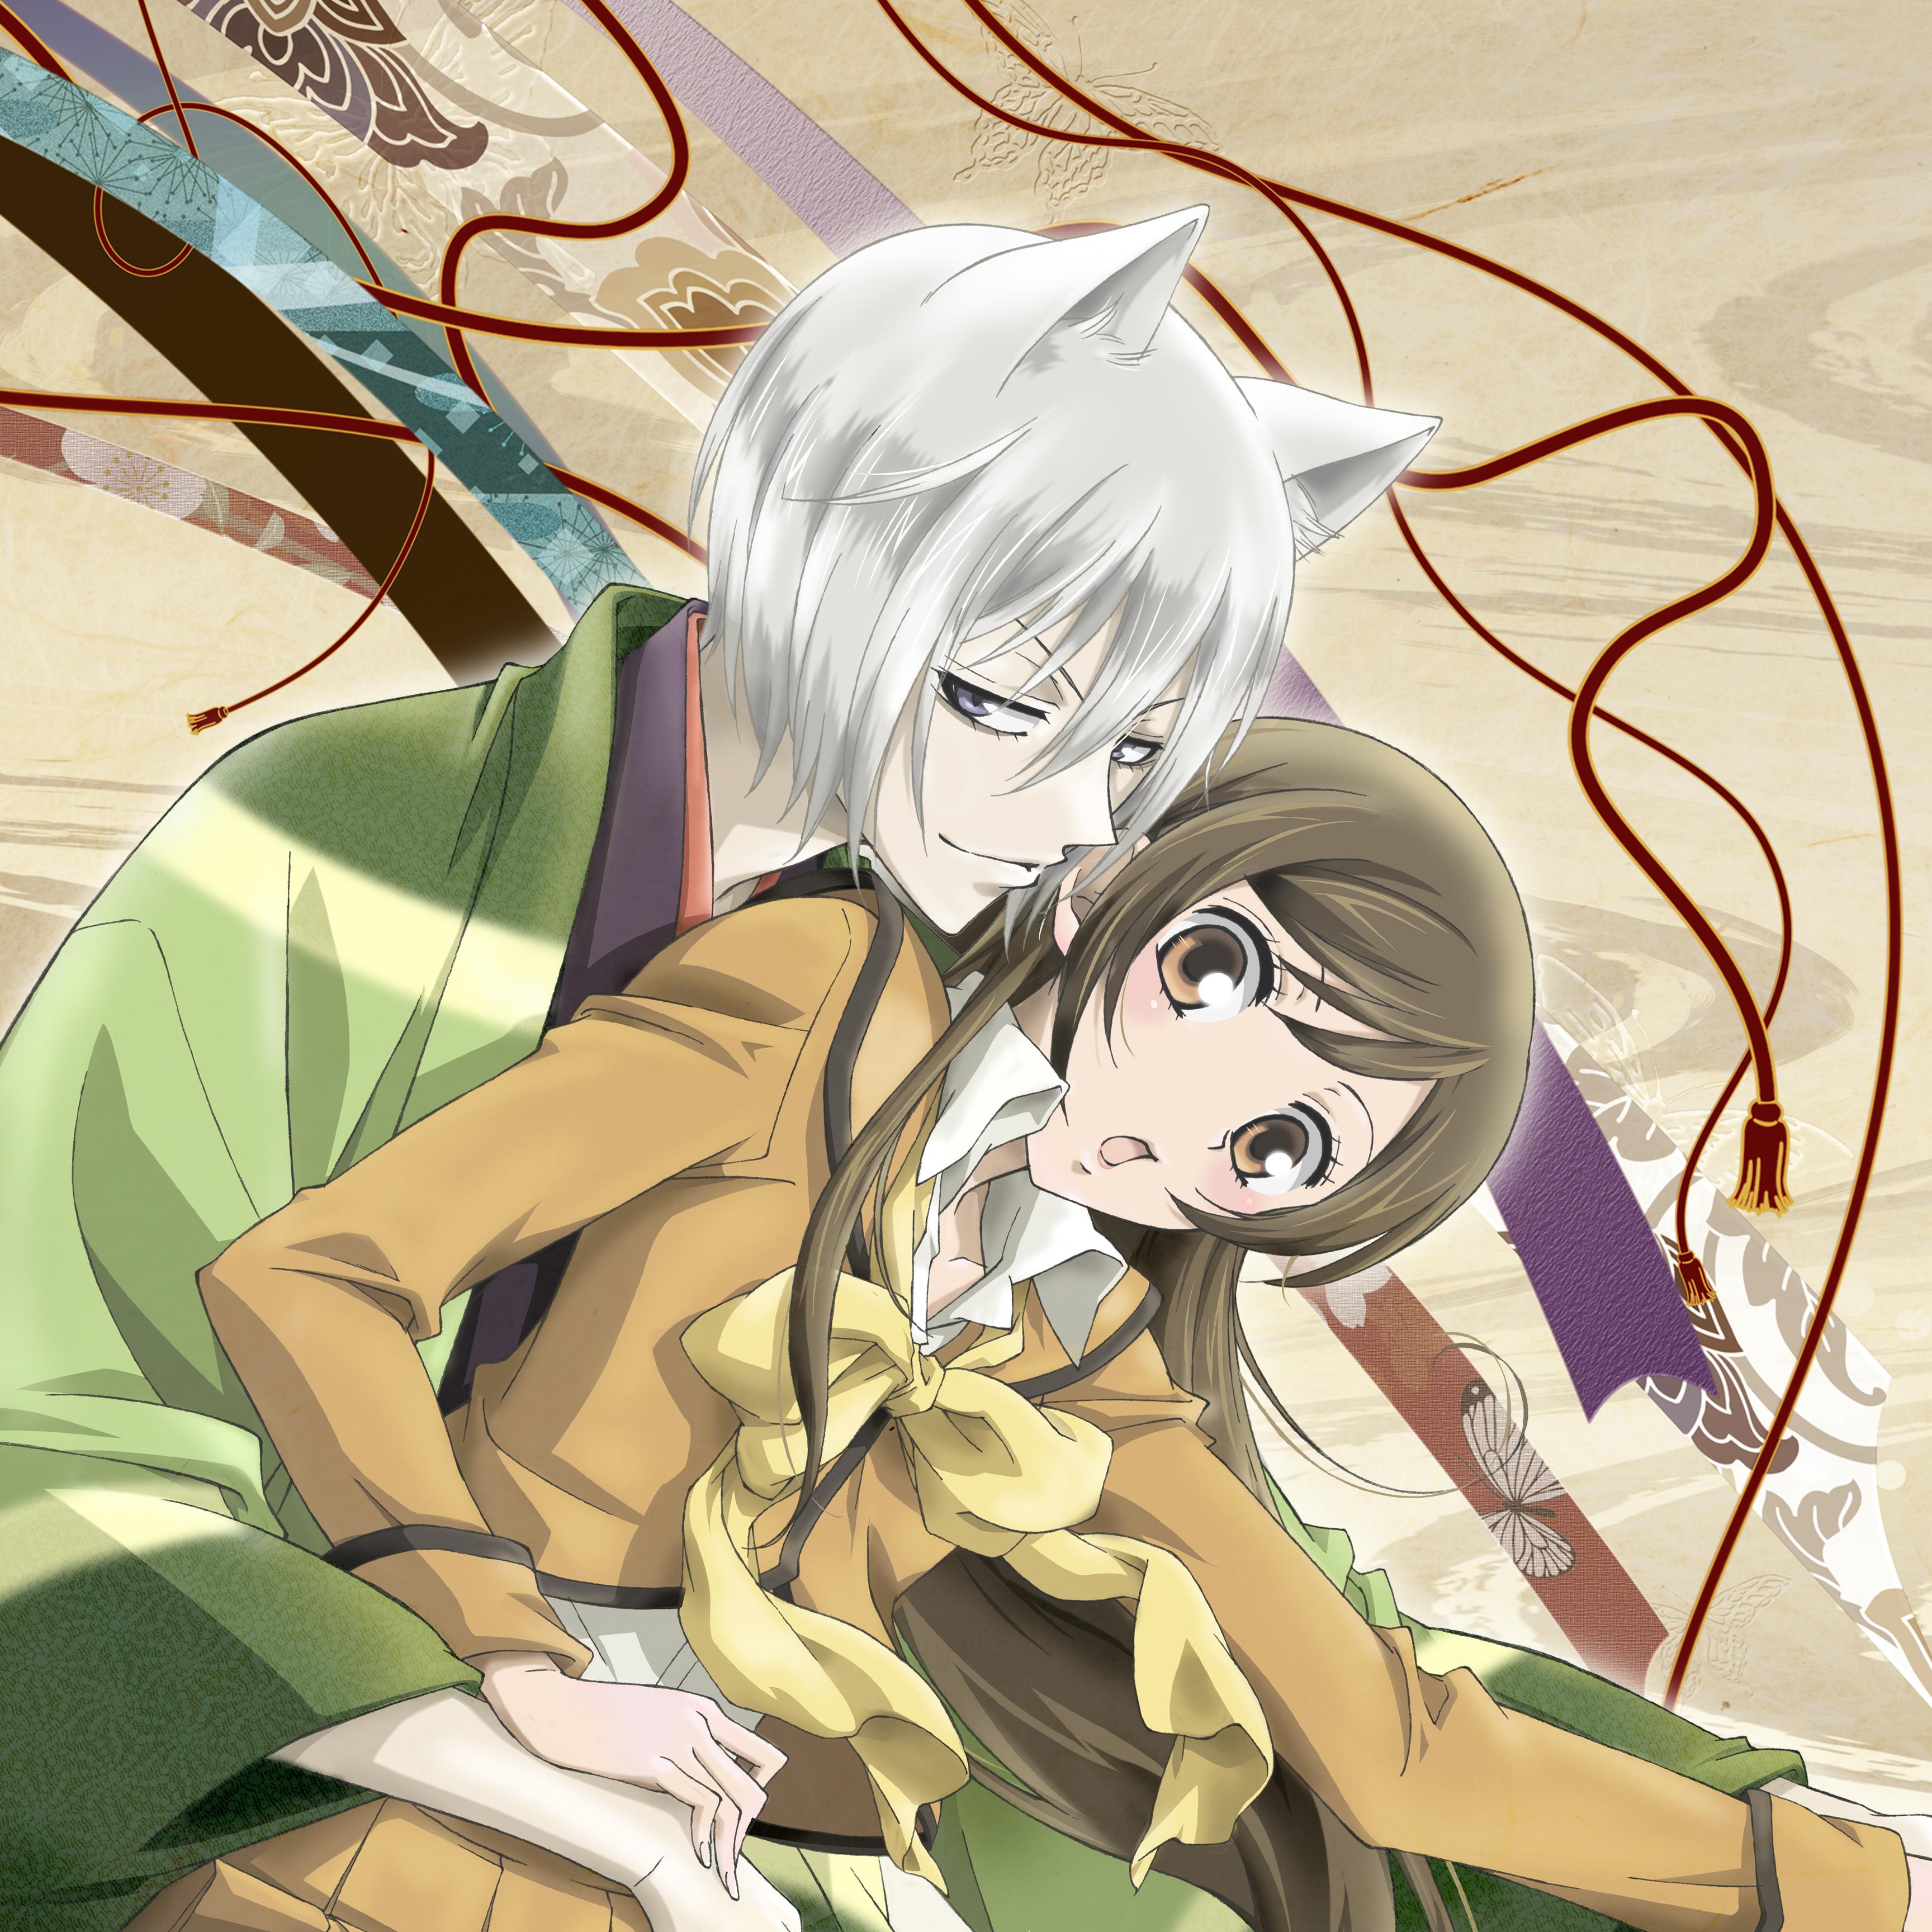 kamisama kiss season 1 watch online free